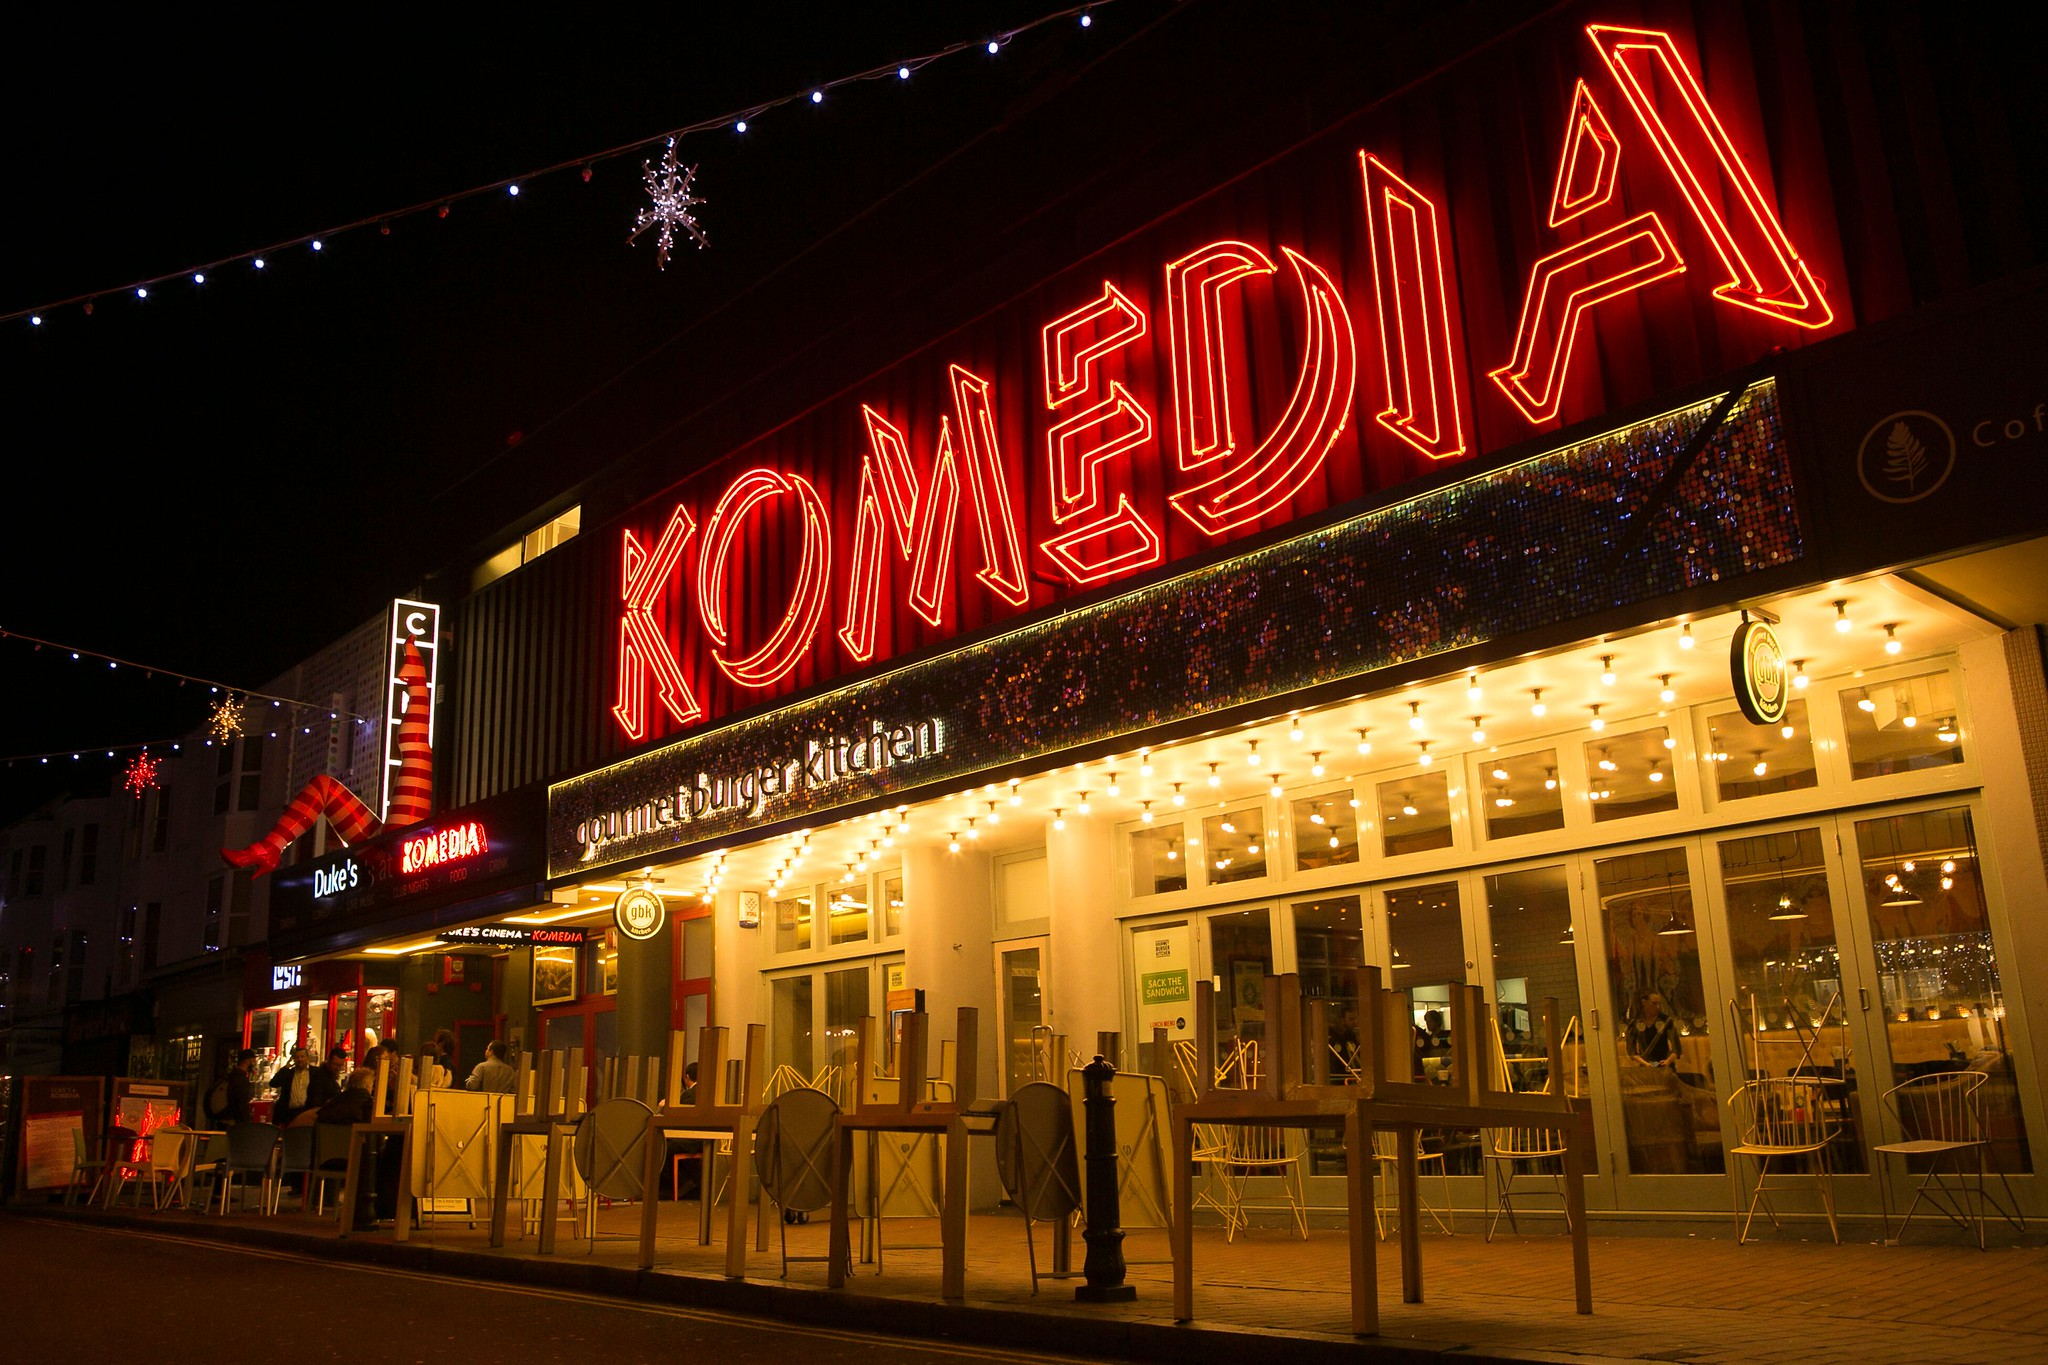 Komedia-Brighton